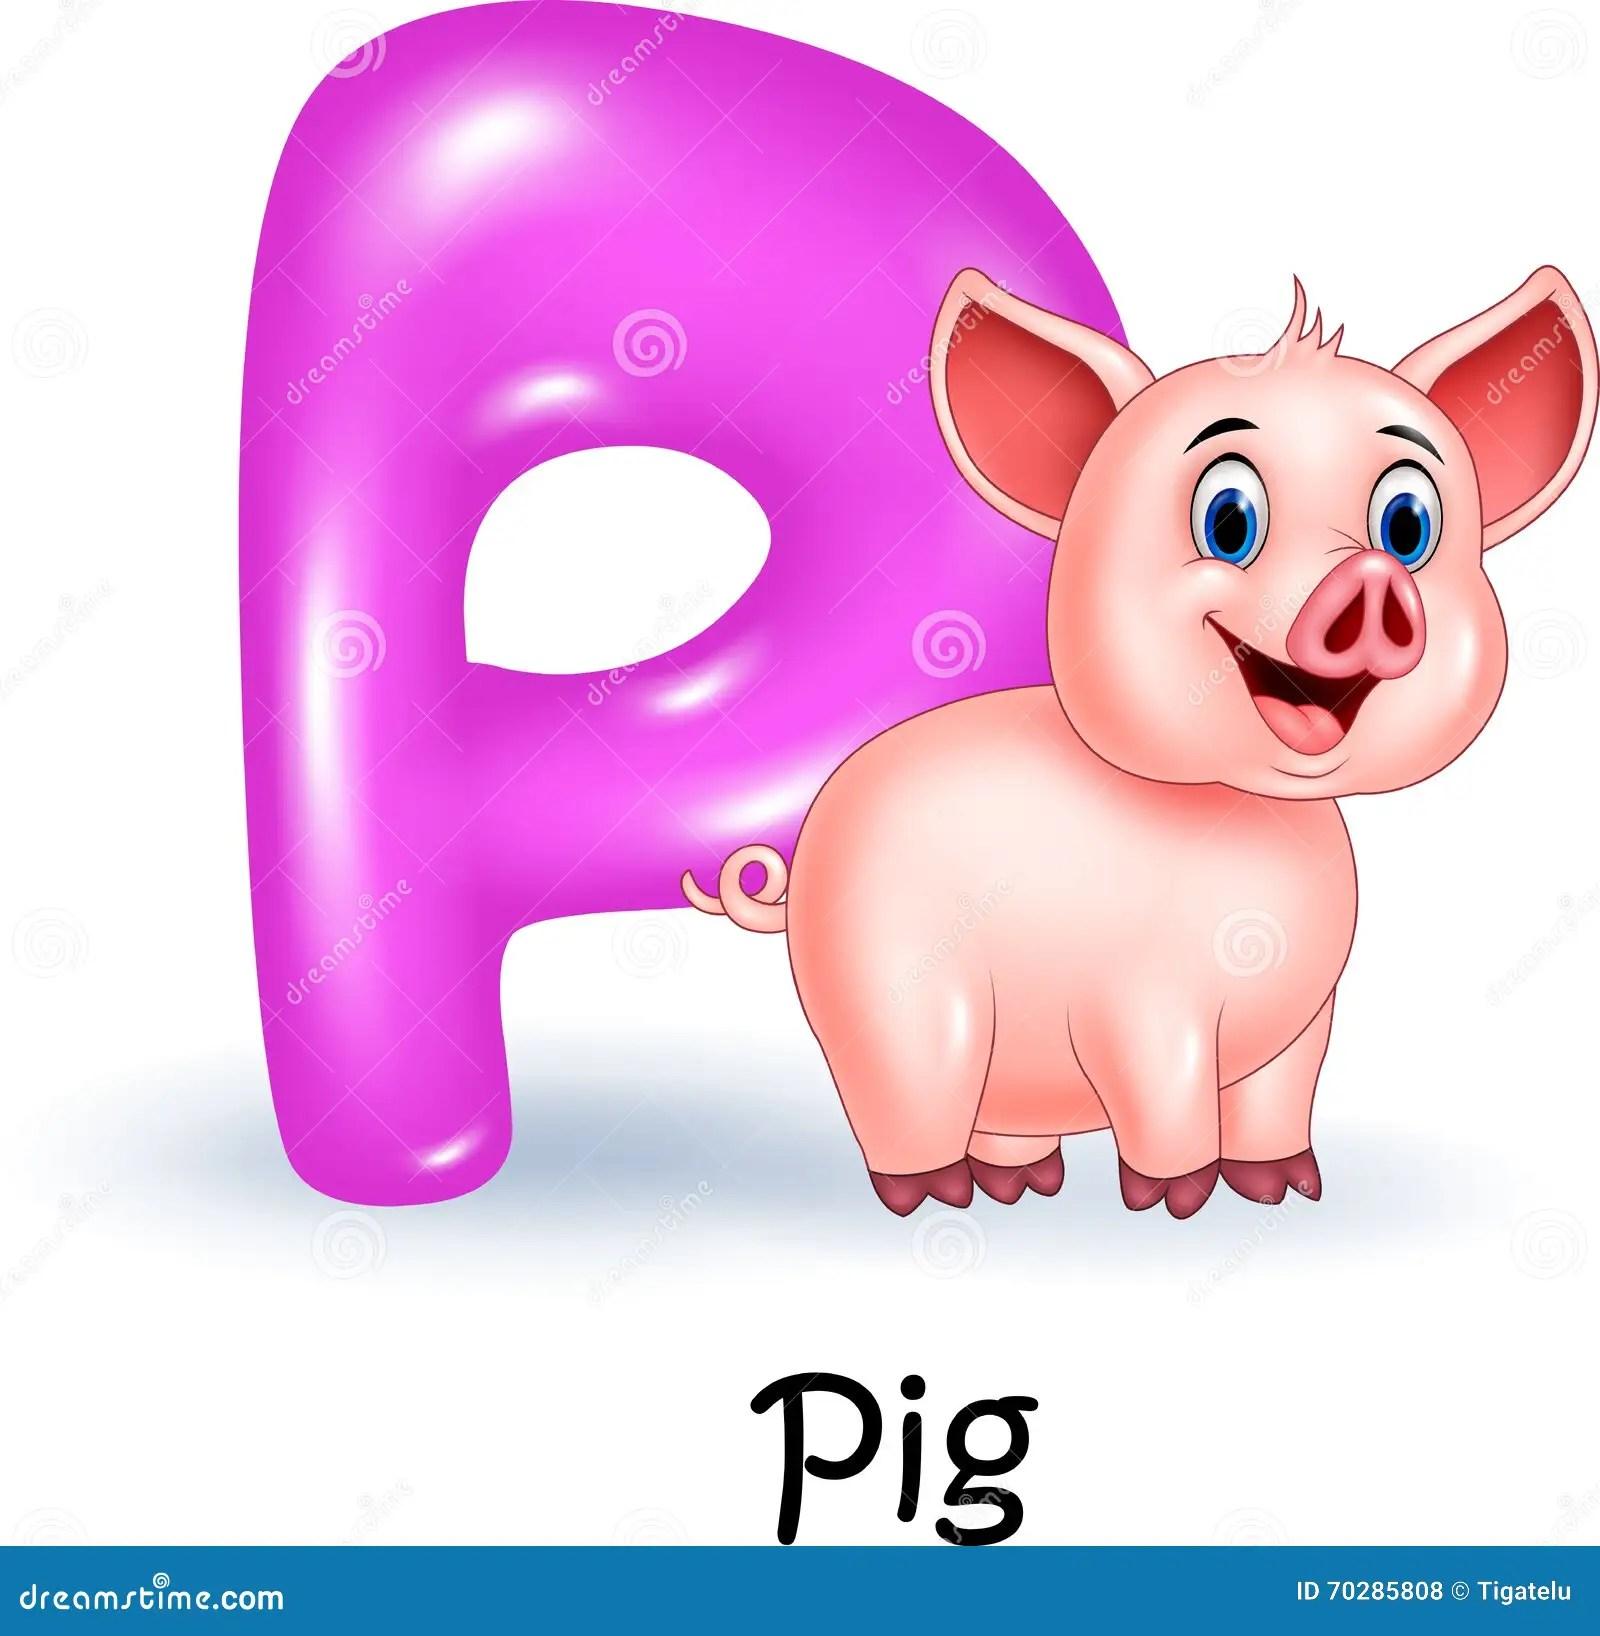 Cartoon Illustration P Of Letter For Pig Stock Vector